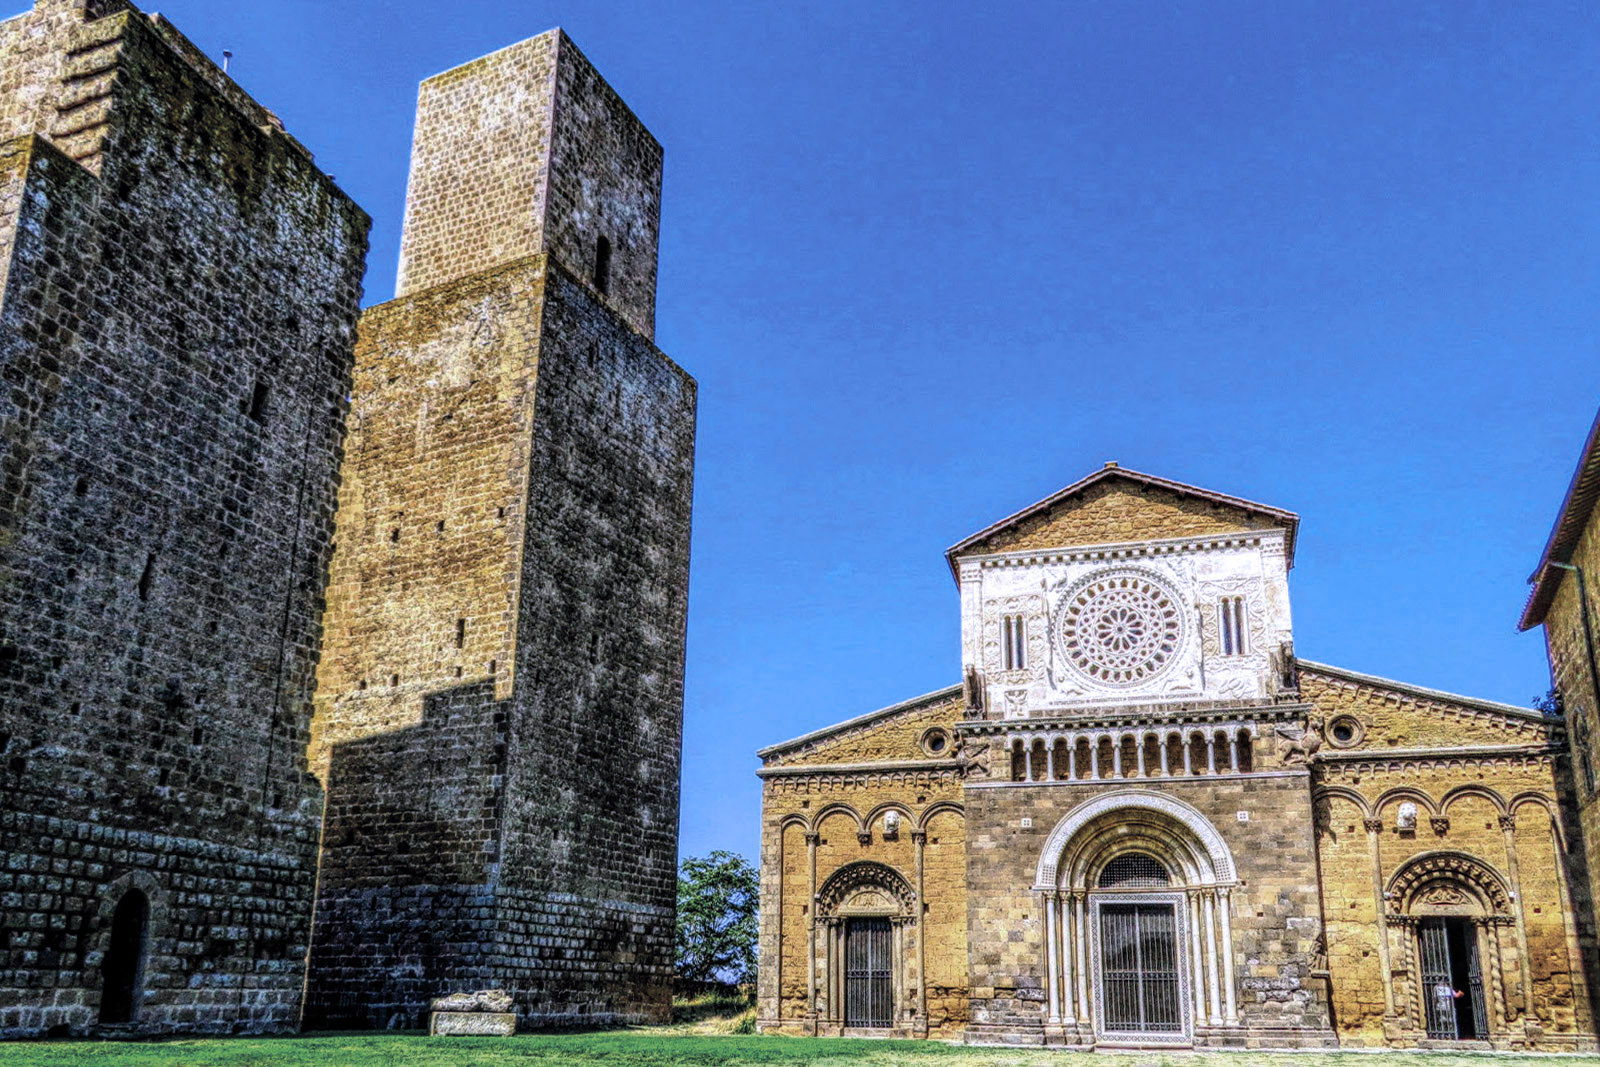 Tuscania, Basilica di San Pietro